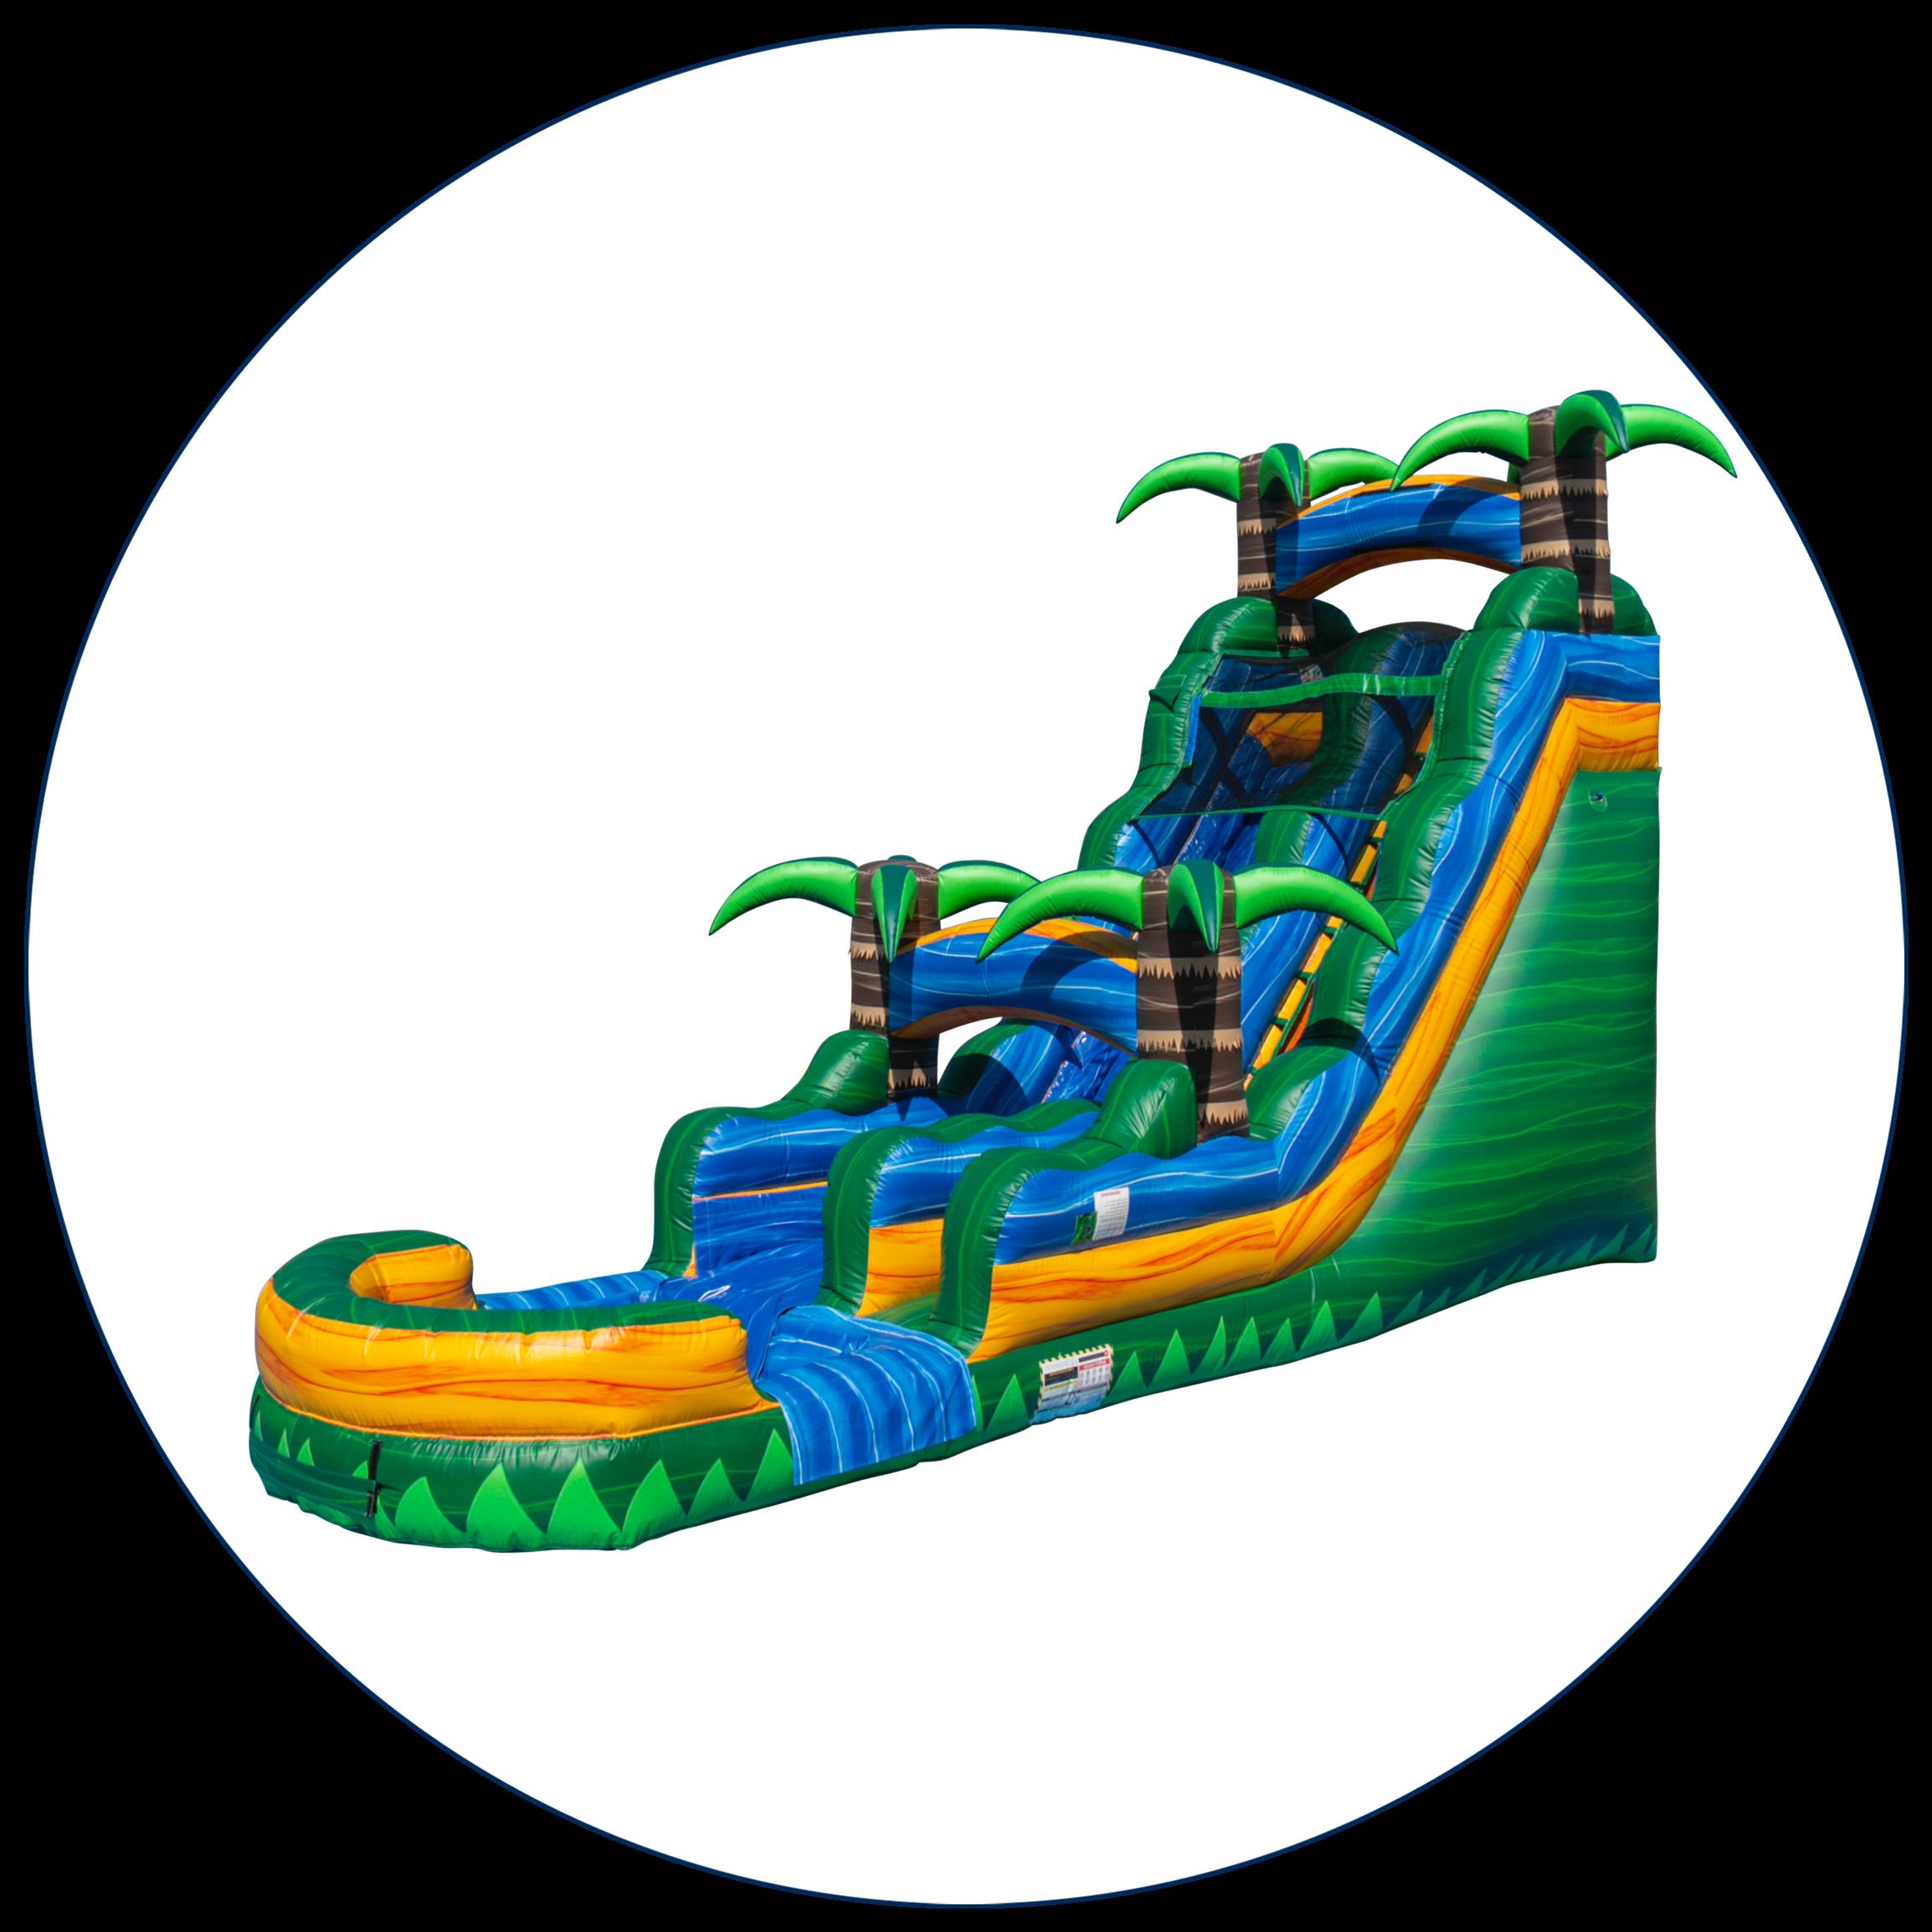 18 Ft. Water Slides